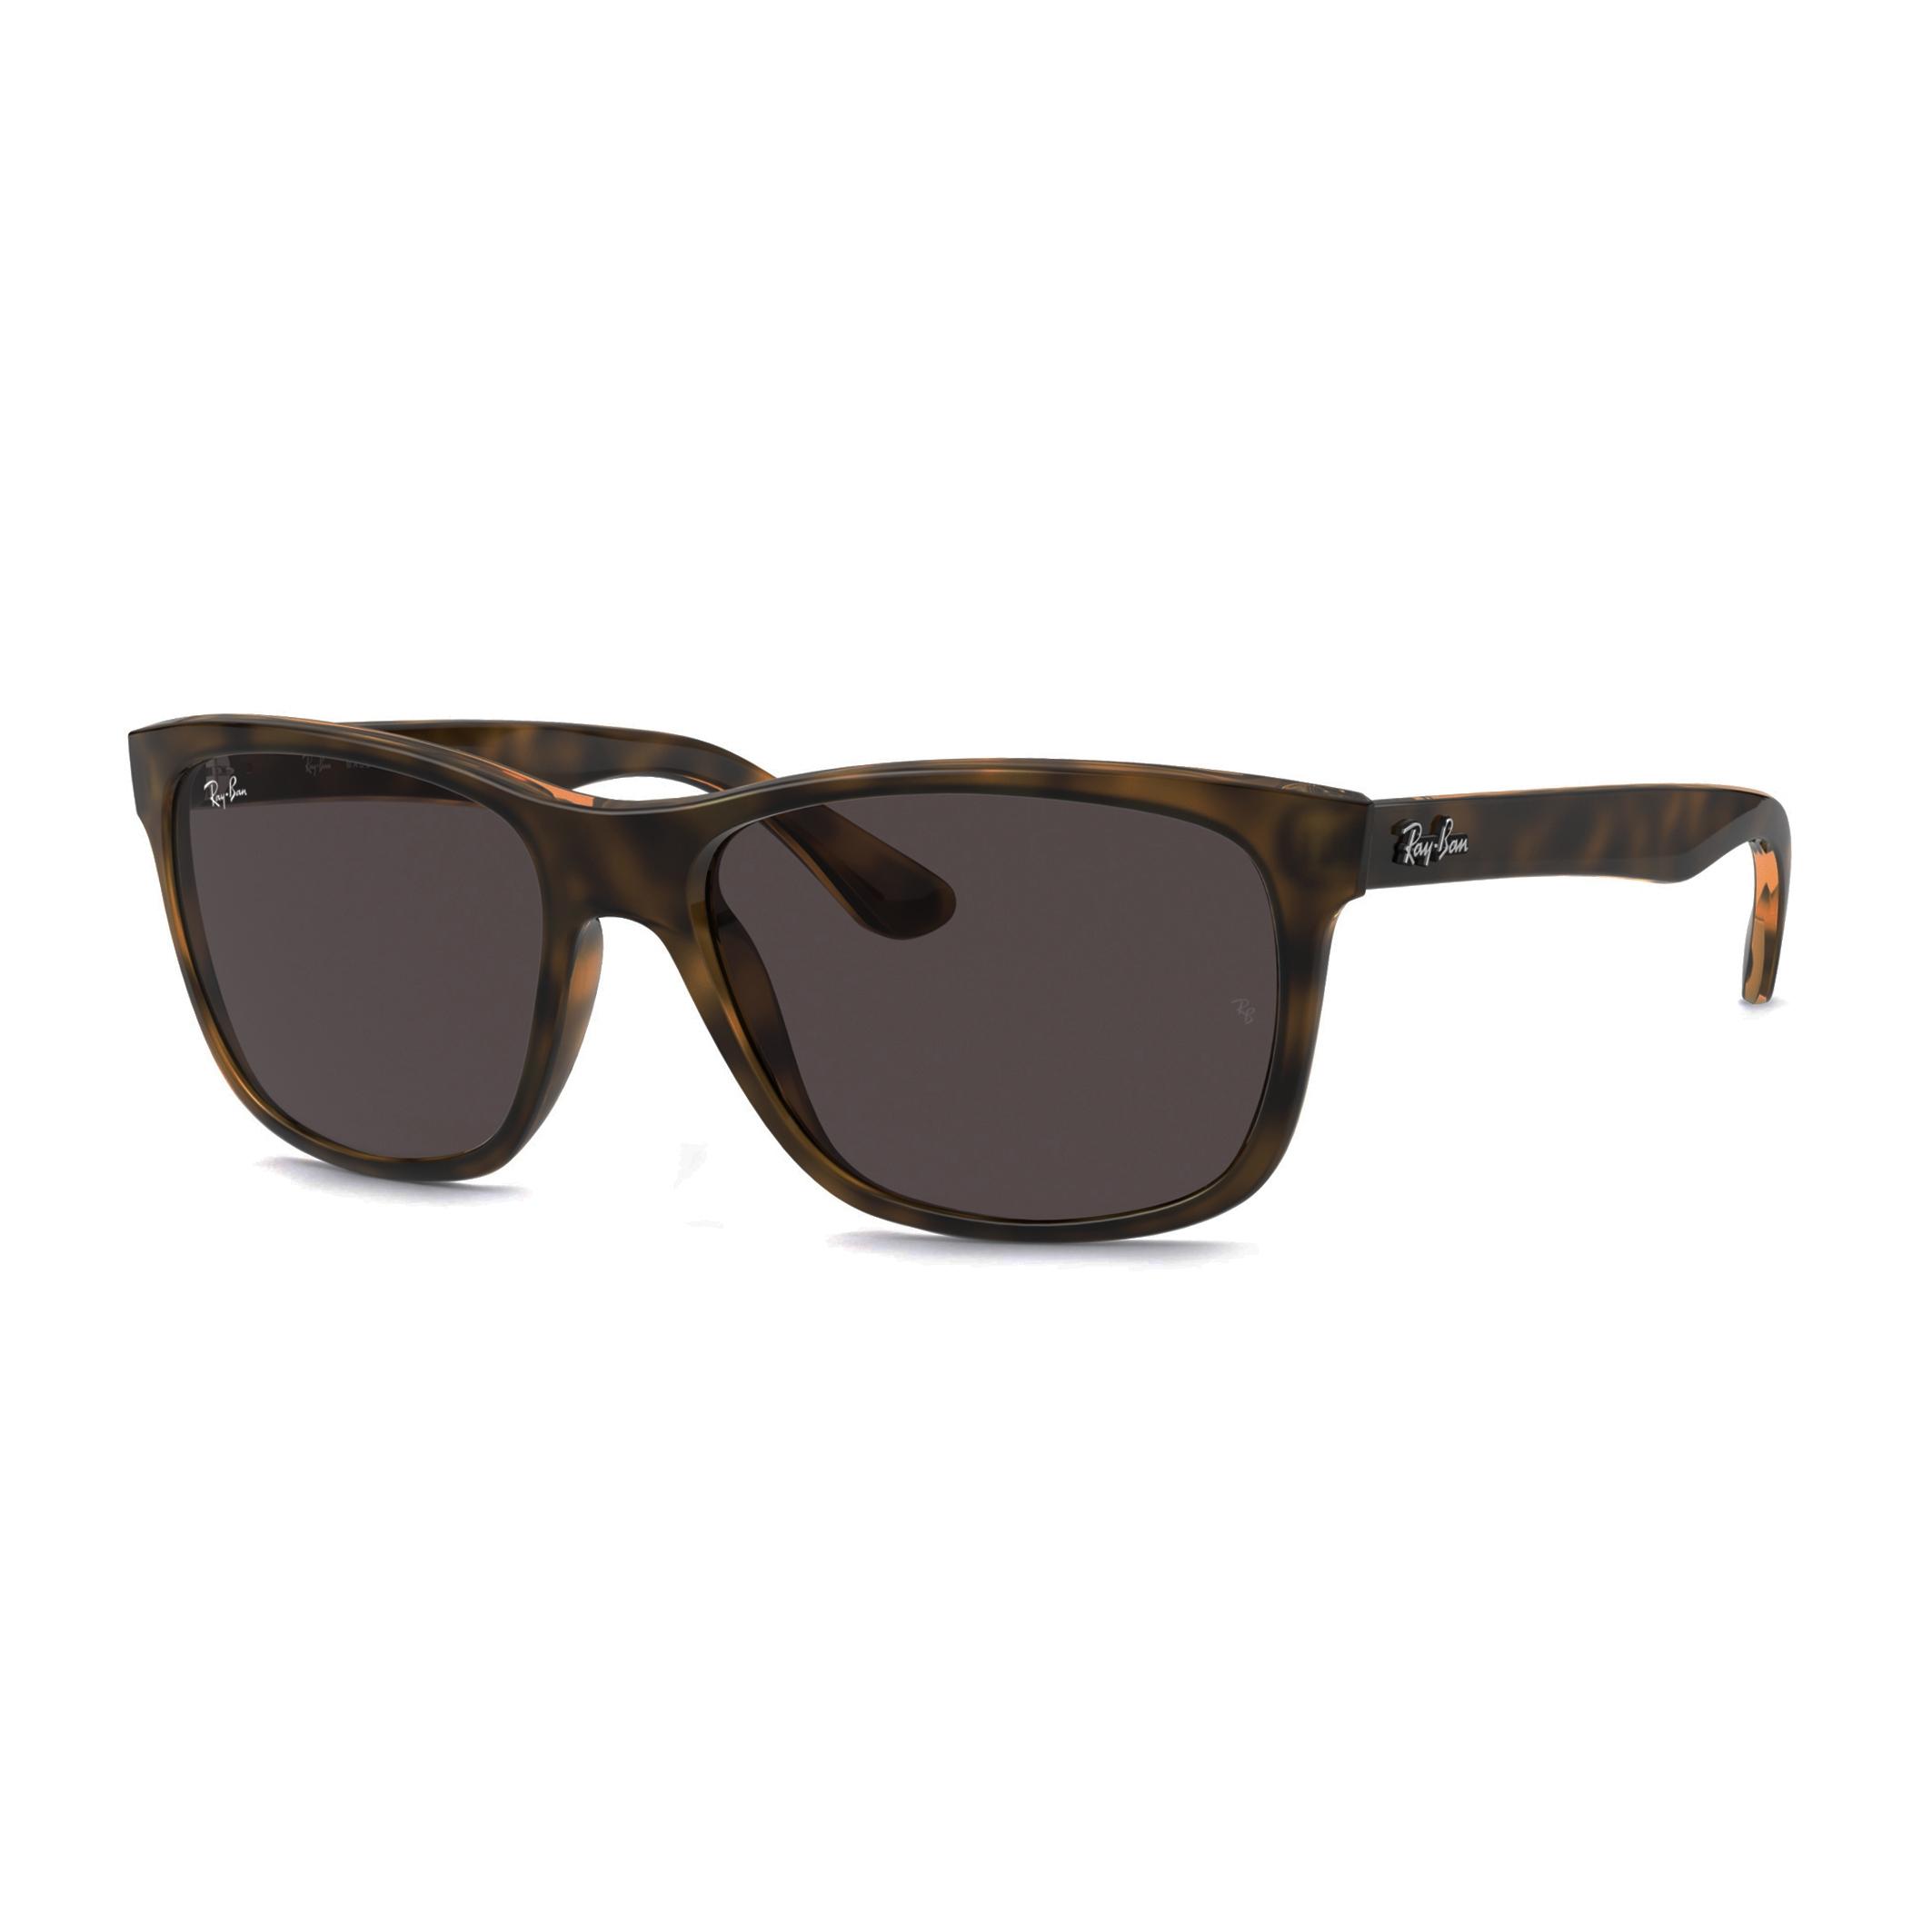 Ochelari de soare Ray-ban 0RB4181 Maro